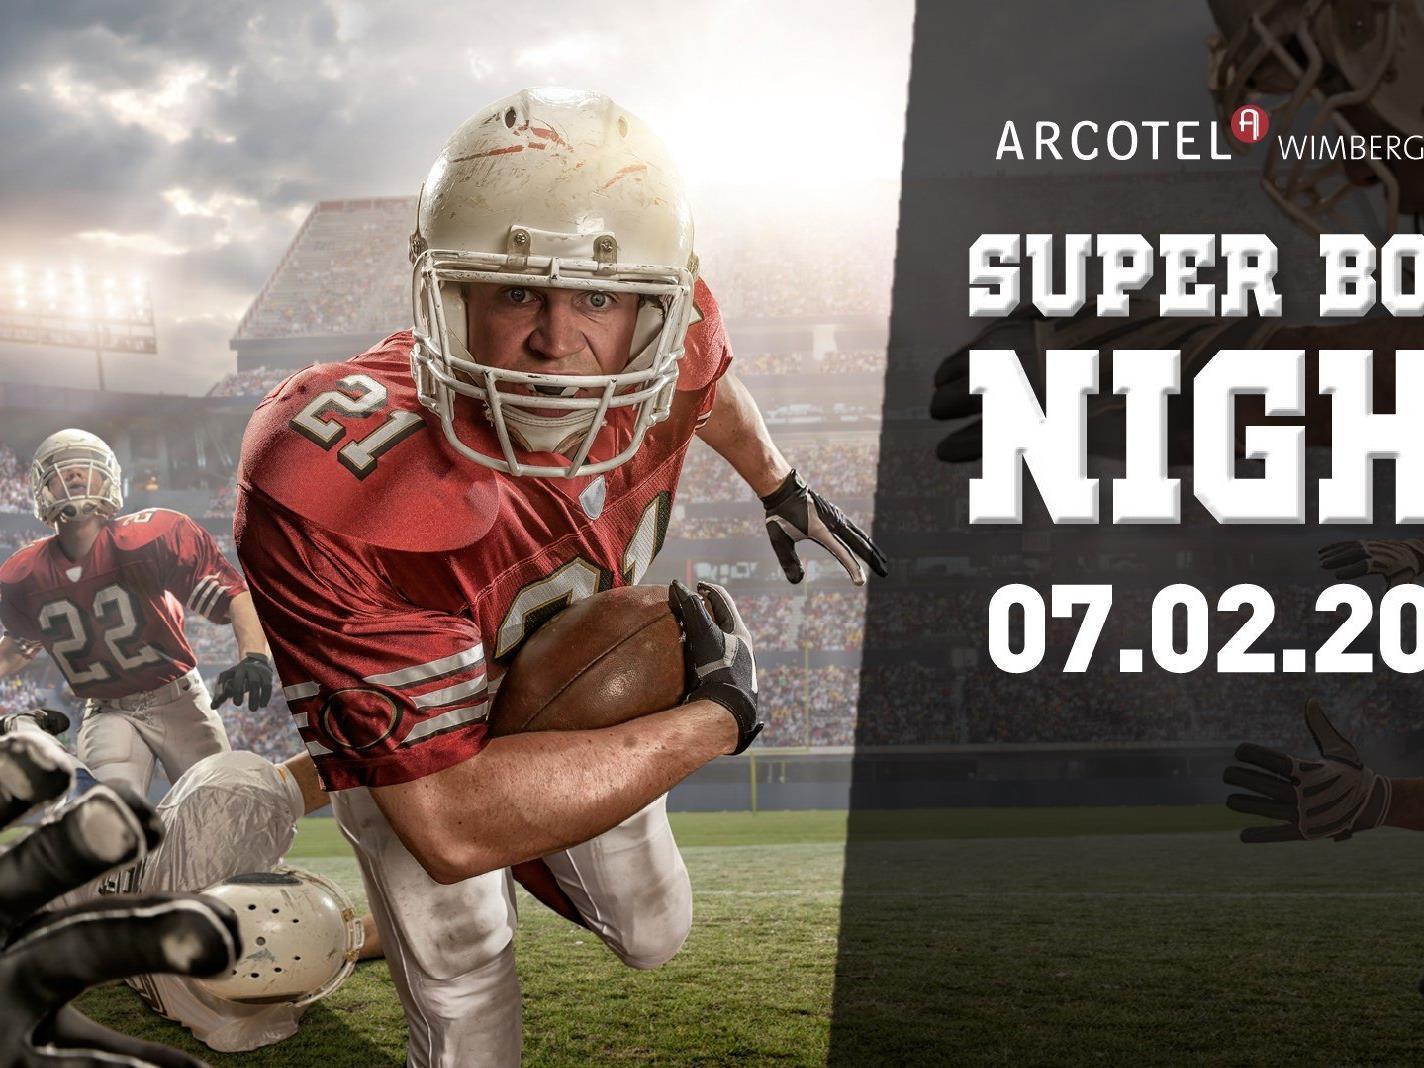 Große Super Bowl-Night im Arcotel Wimberger am 7. Februar 2016.